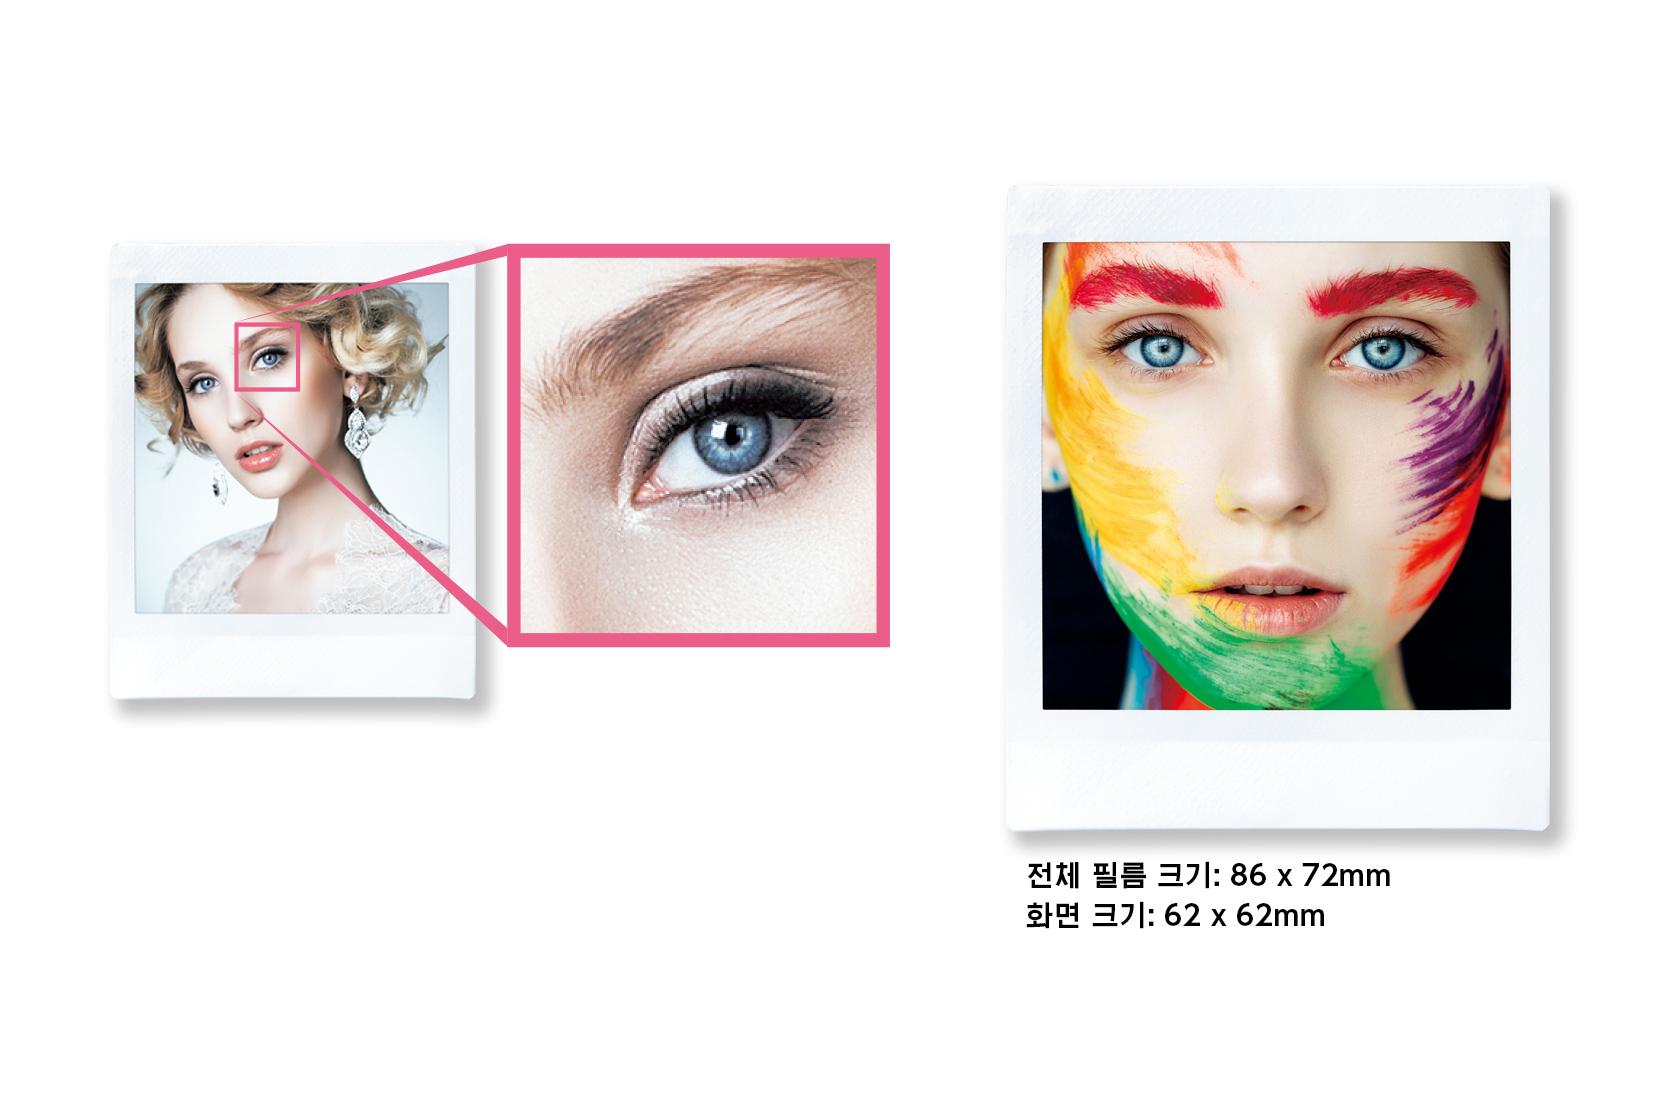 [photo] 여성 인물 사진의 눈을 확대하여 인스탁스 쉐어 SP-3의 뛰어난 이미지 품질을 보여주는 샘플 사진과 다양한 색상으로 페이스 페인팅을 한 여성 인물 사진.